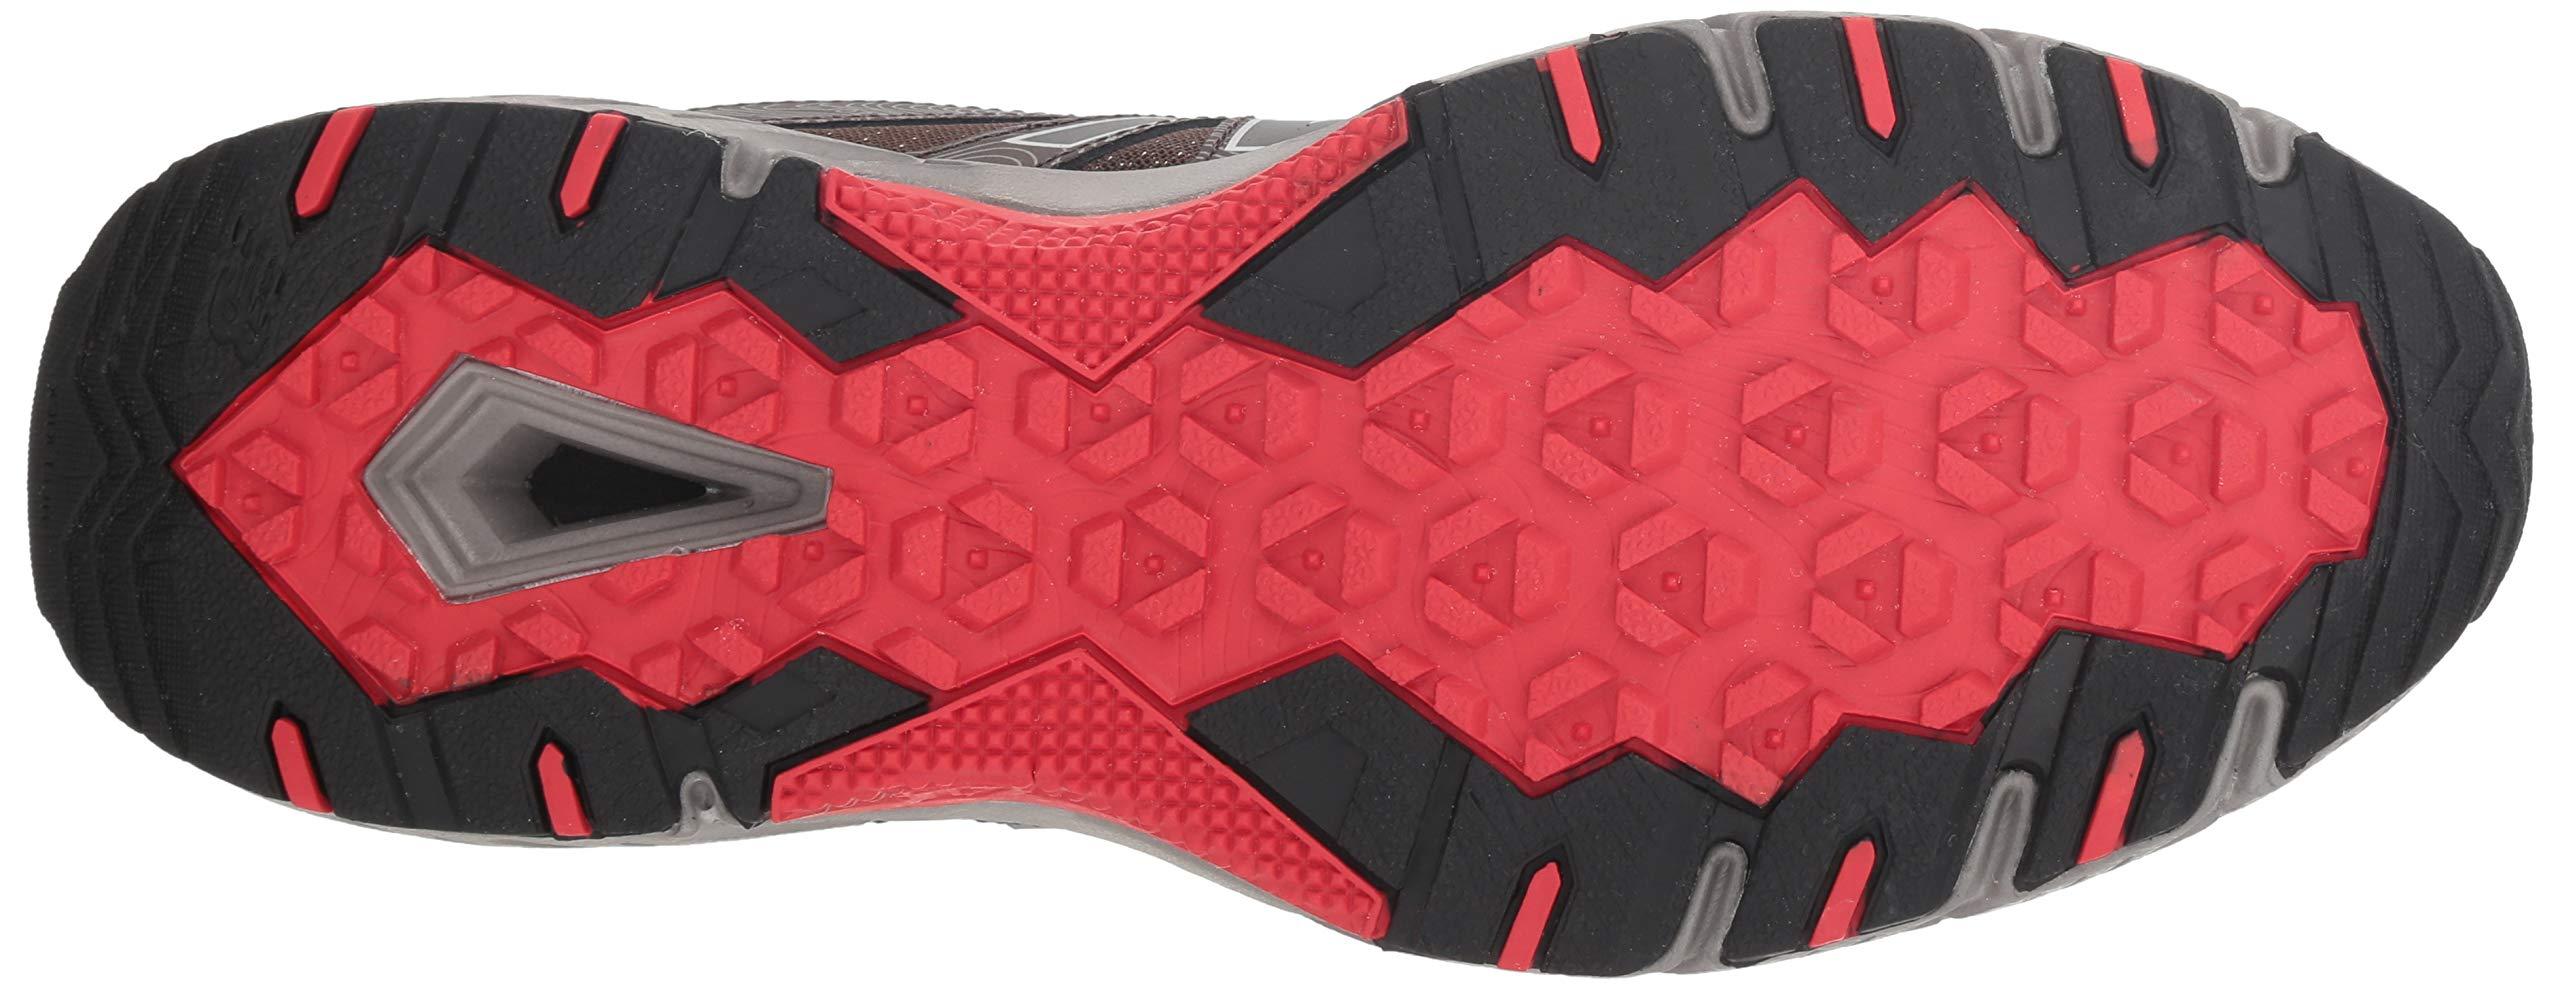 New Balance Men's 510v4 Cushioning Trail Running Shoe, Chocolate/Black/Team red, 7 D US by New Balance (Image #3)